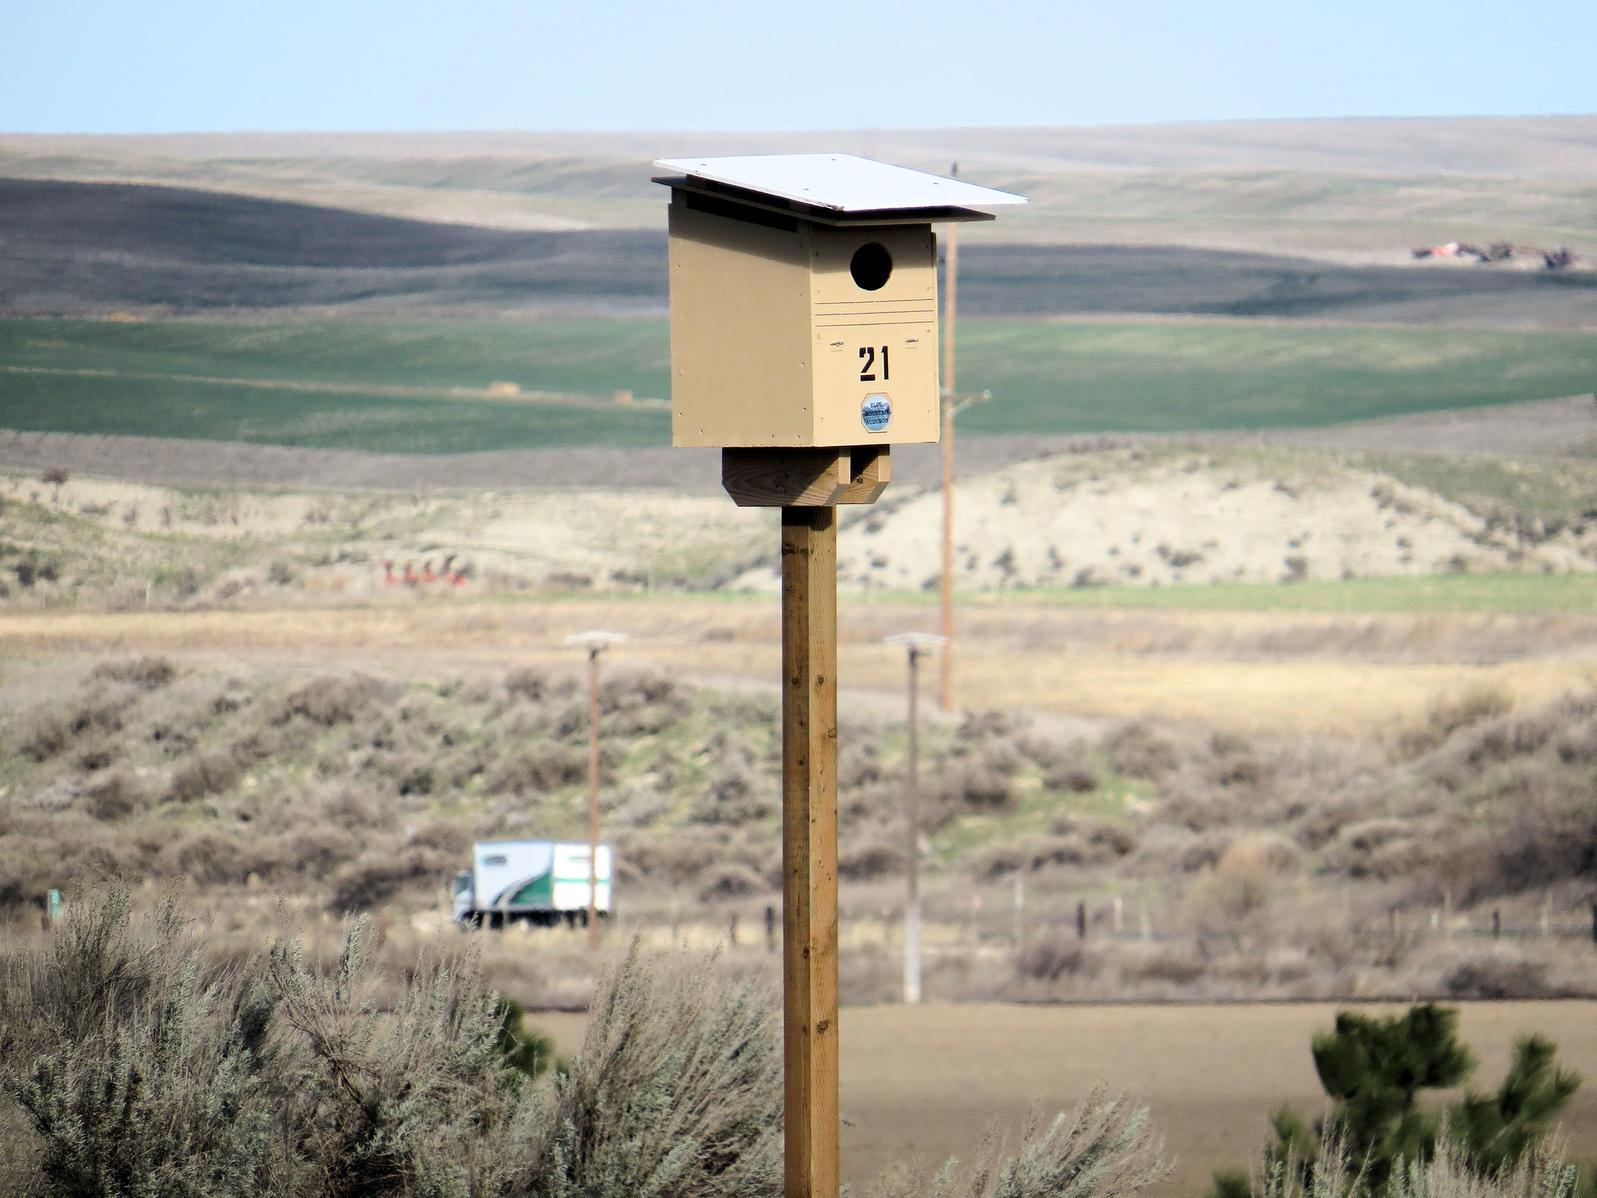 Washington State Penitentiary inmates are helping Blue Mountain Audubon Society build nest boxes for Barn Owls in Walla Walla, Washington. G. Jameson